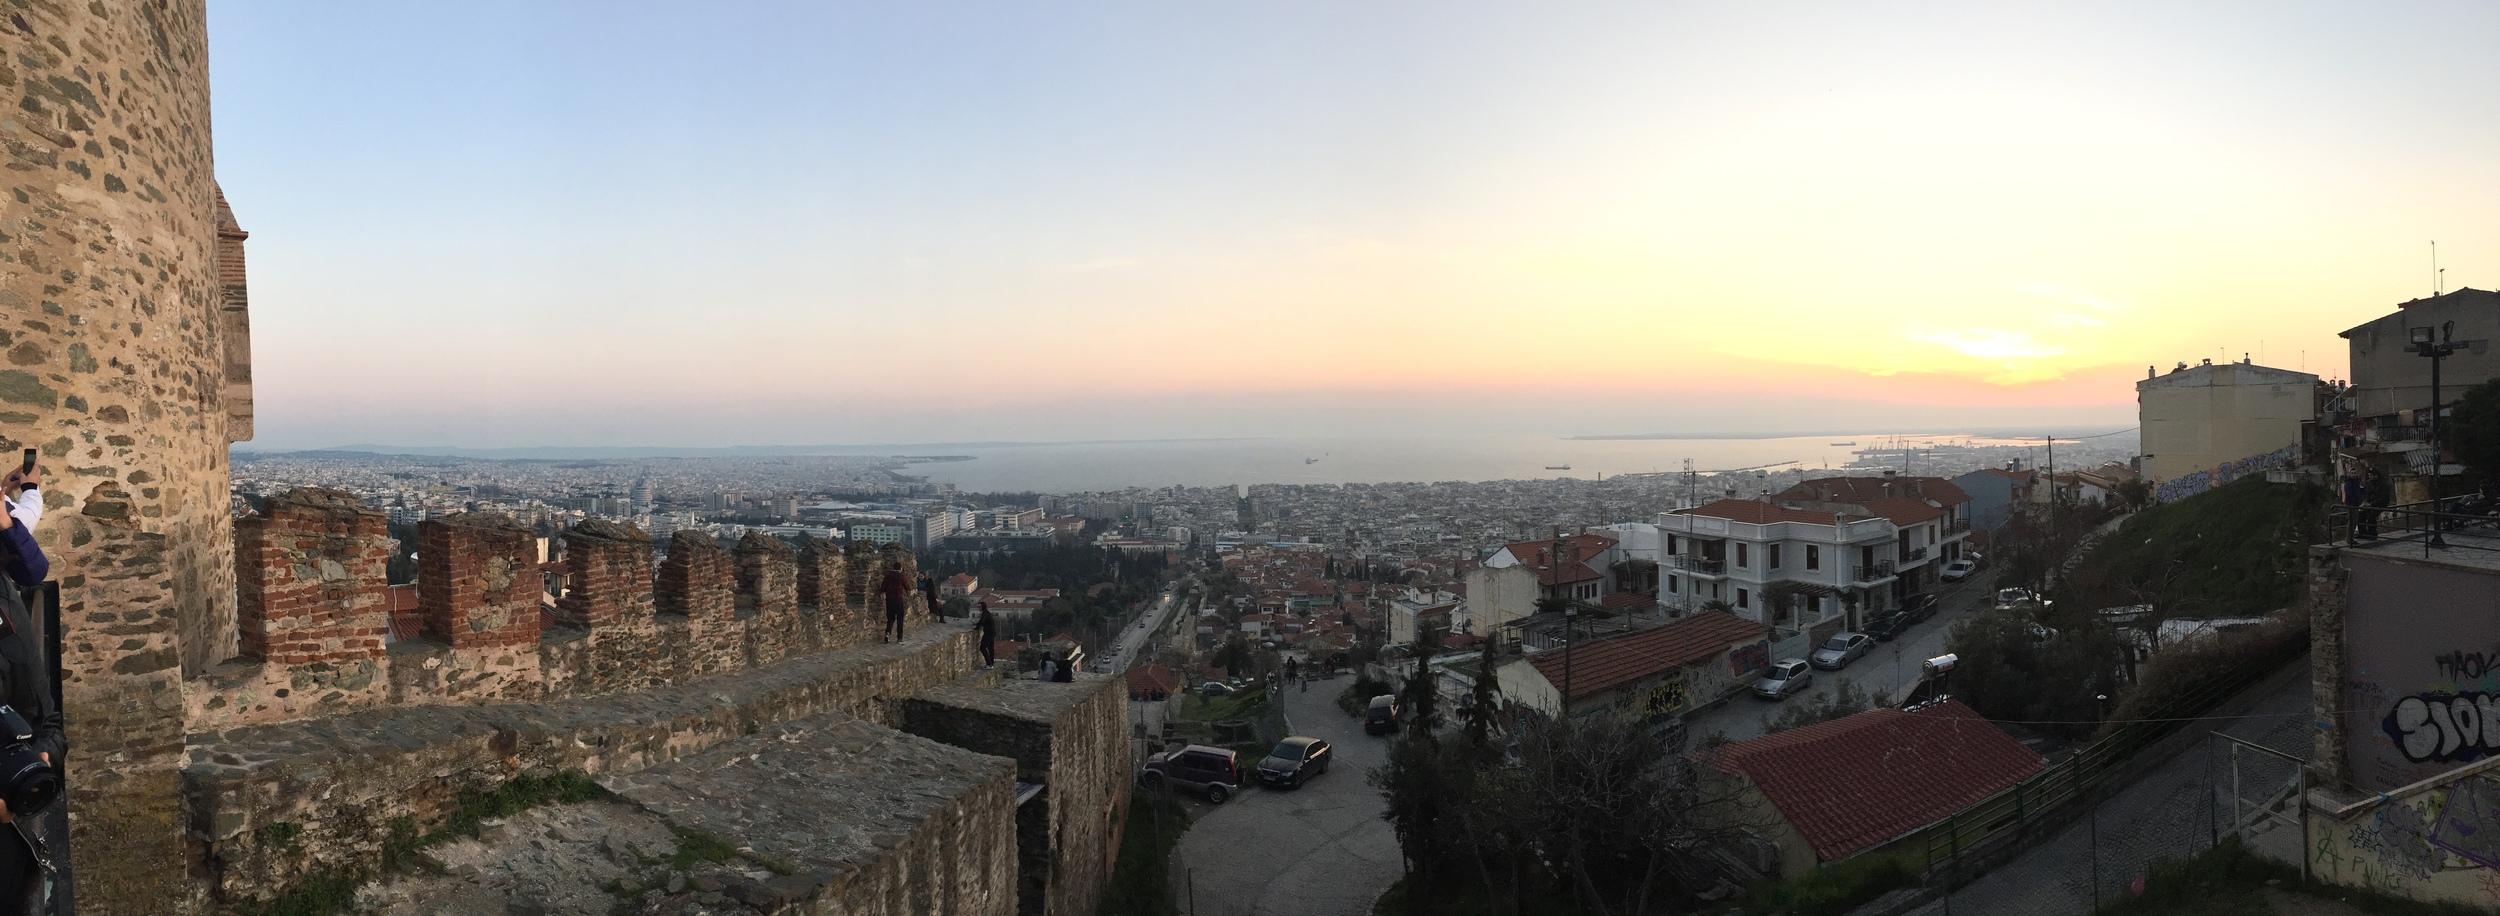 Thessaloniki, Grekland. Min bild!